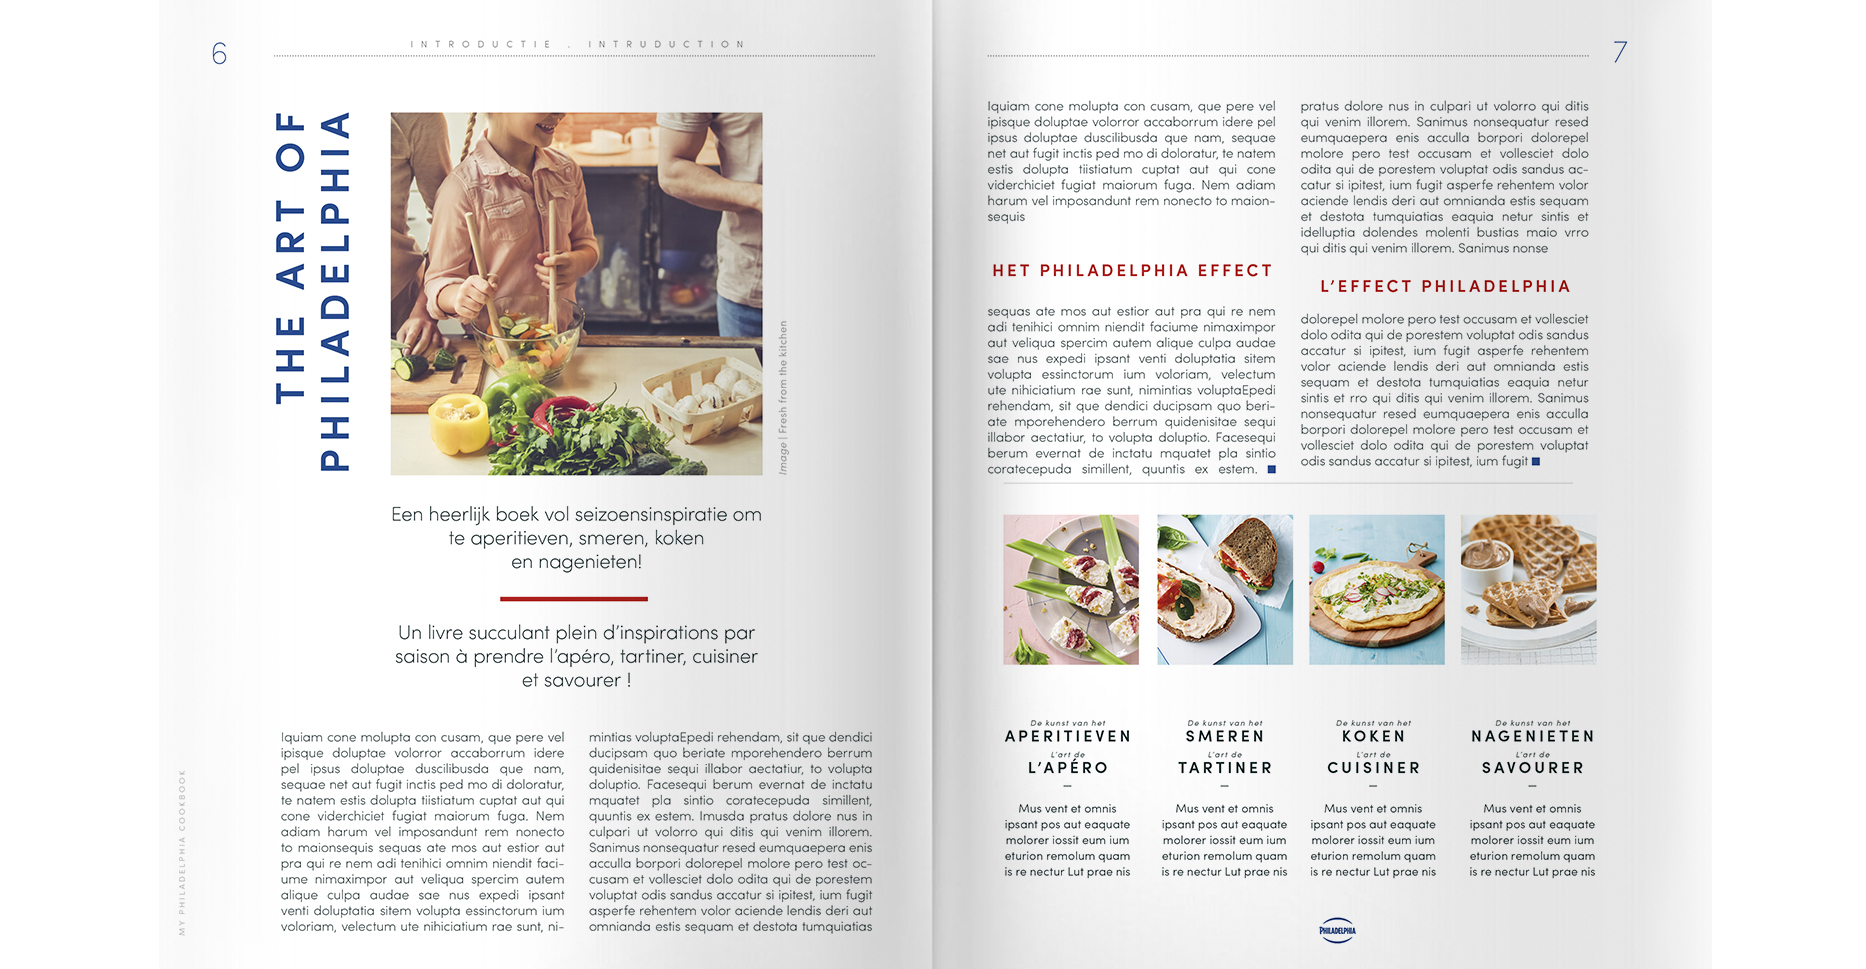 Philadelphia-Receptenboek_0005.jpg